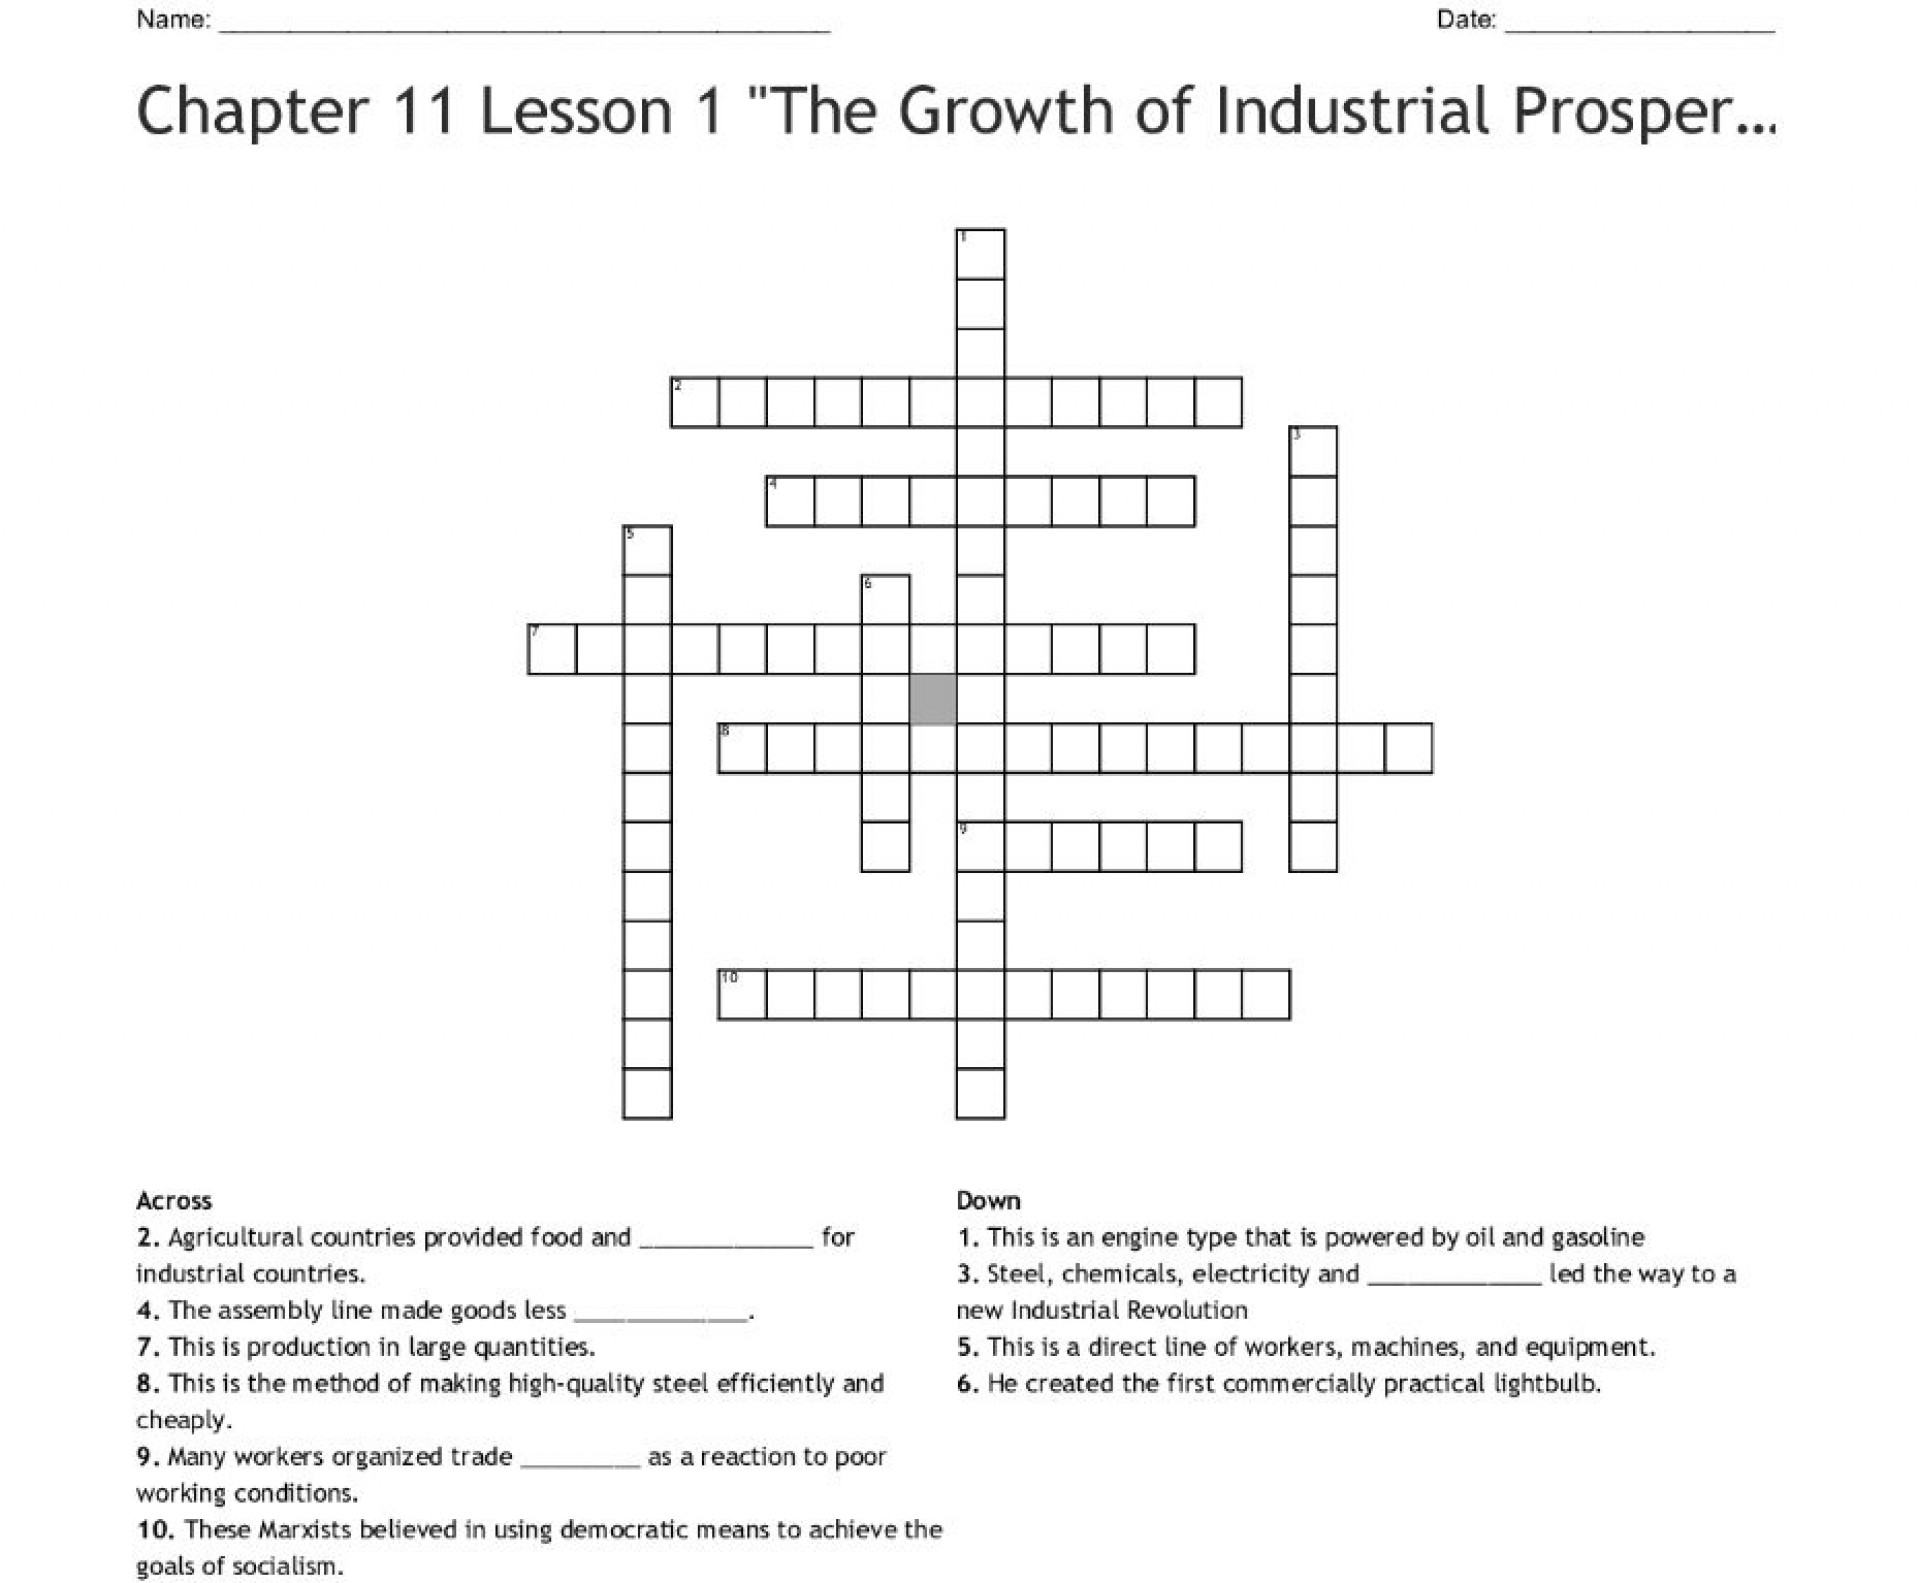 000 Unbelievable Prosperity Crossword Design  Clue 6 Letter Material Prosperou 41920